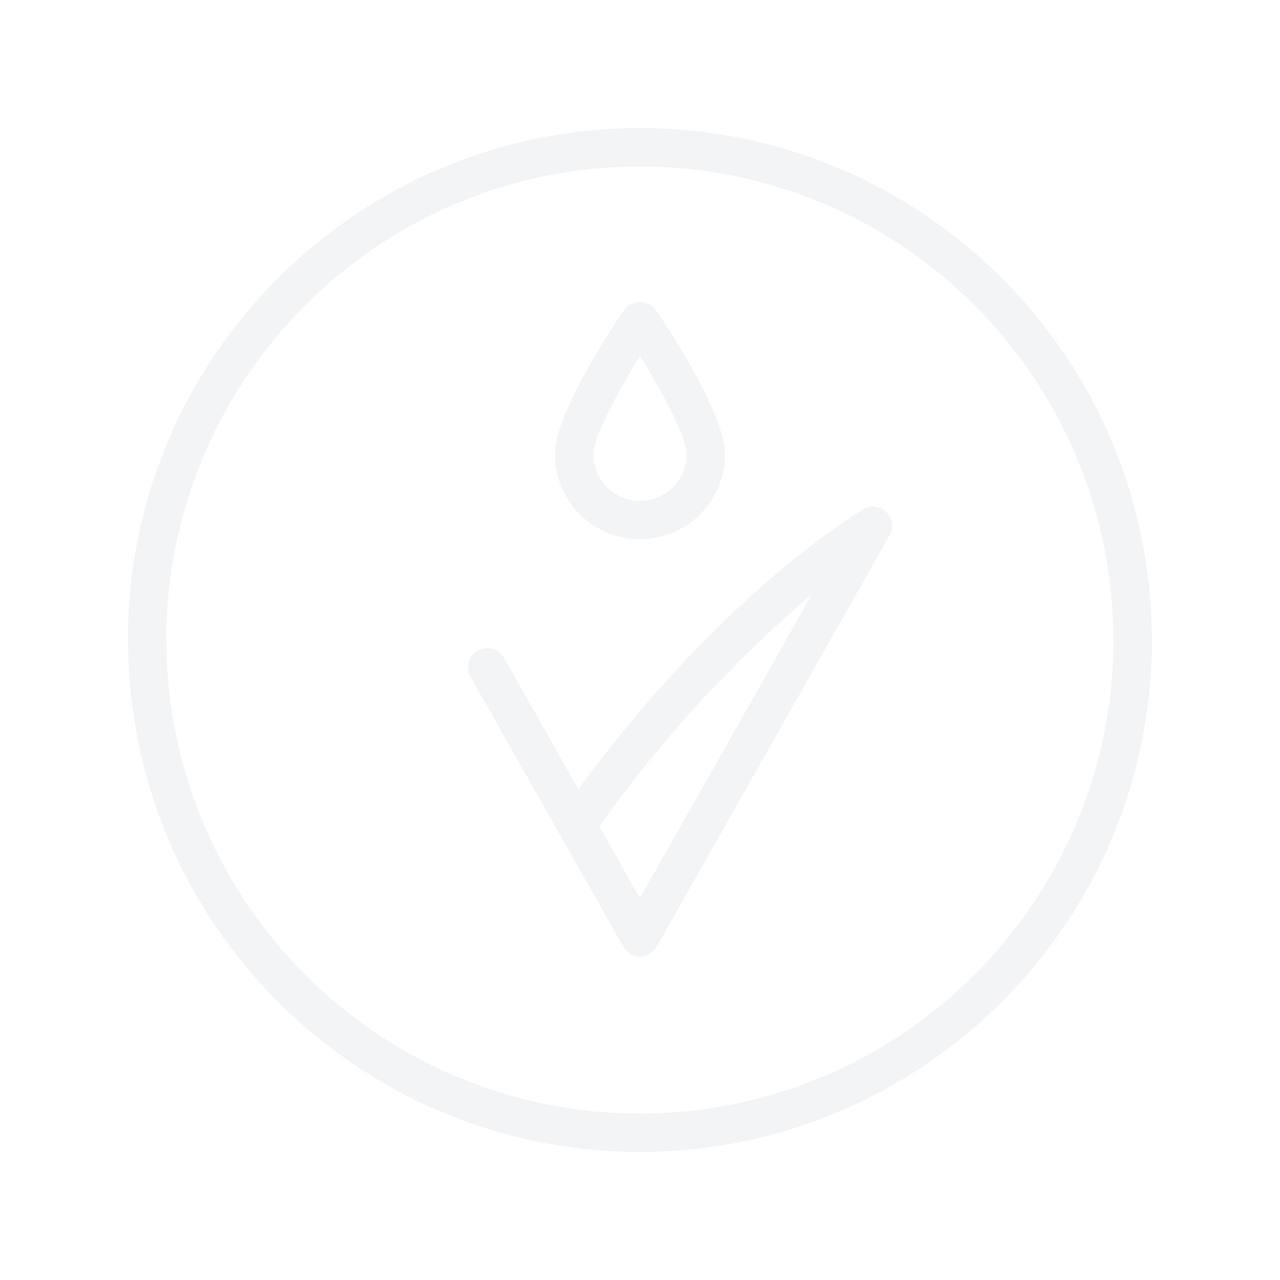 Guerlain Eyebrow Kit No.00 Universel 4g